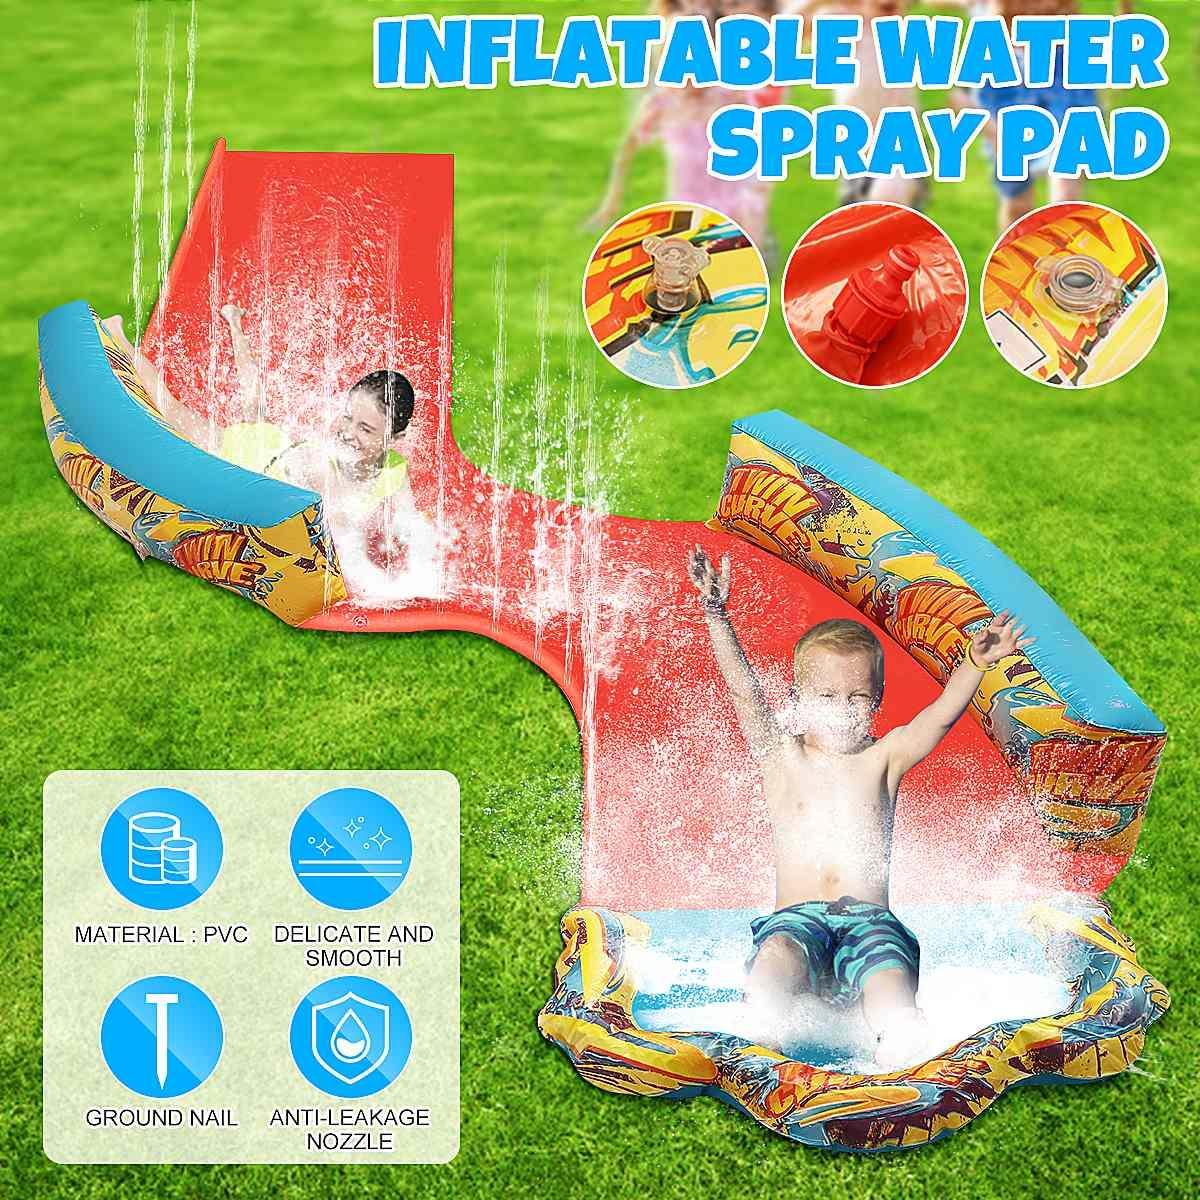 Inflatable Lawn Water Slide Double People Water Splash Slide Kids Toys Water Slide Outdoor Garden Swimming Pool Inflatable Slide